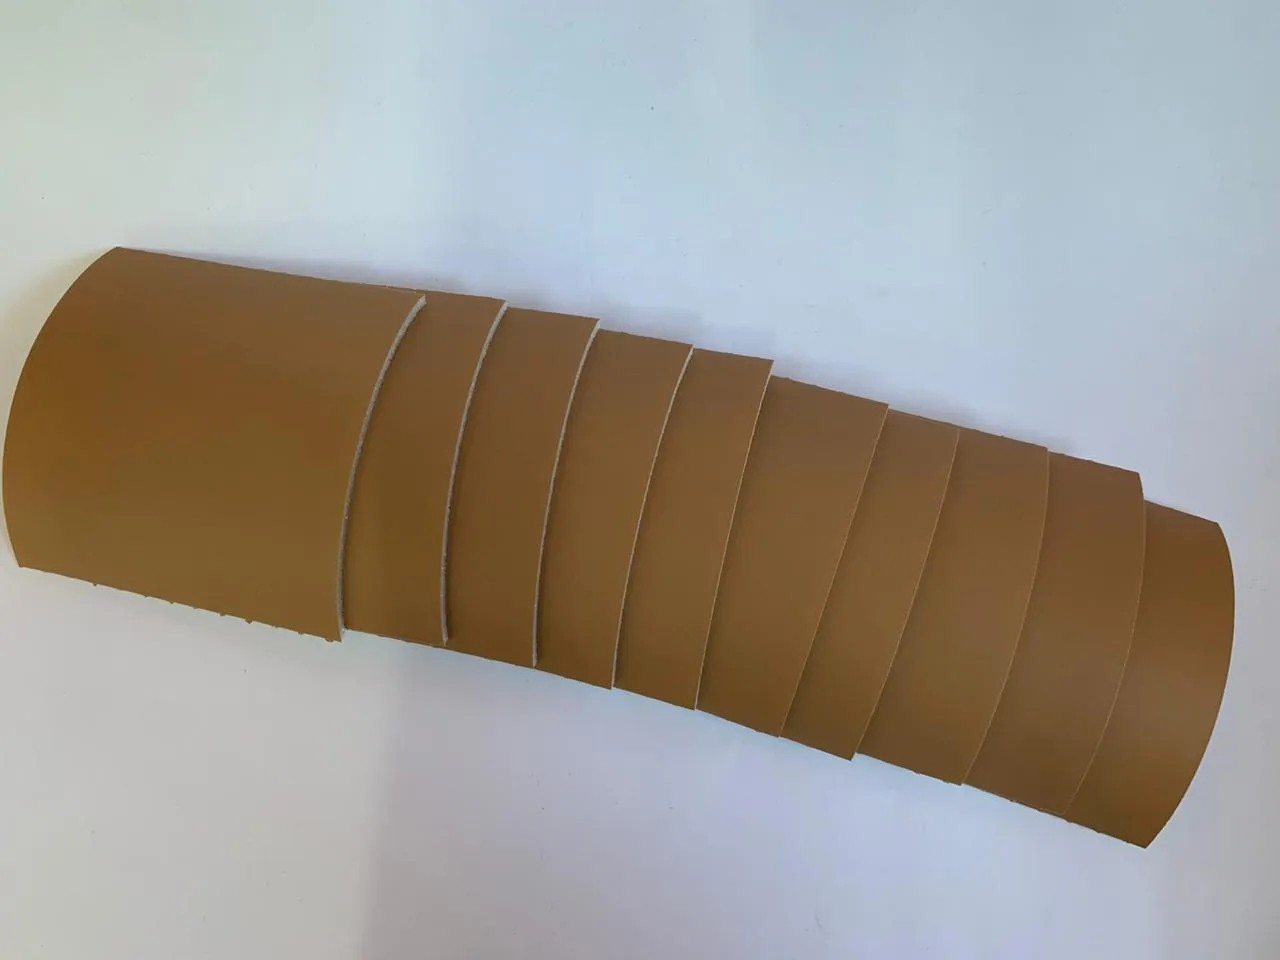 Lixa para artesanato - Esponja Abrasiva Flexível - SoftFlex - 10 unidades